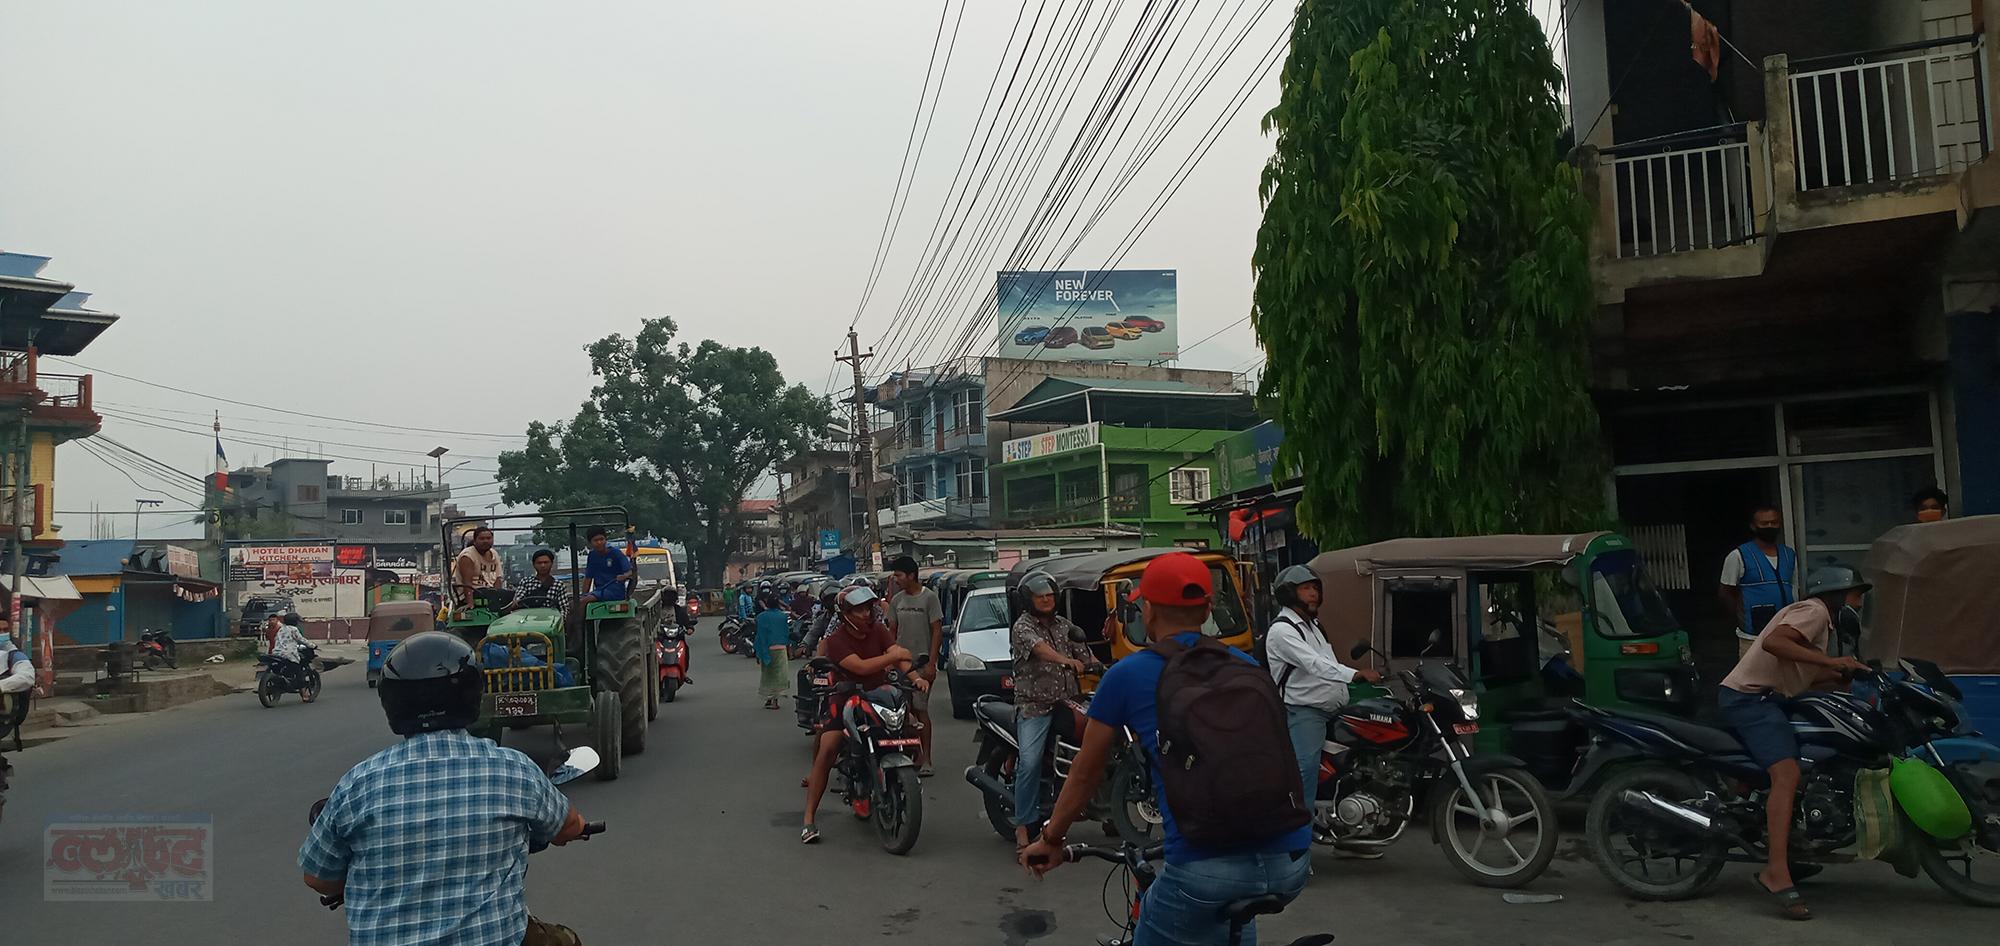 Dharan-Petrol_Pump2